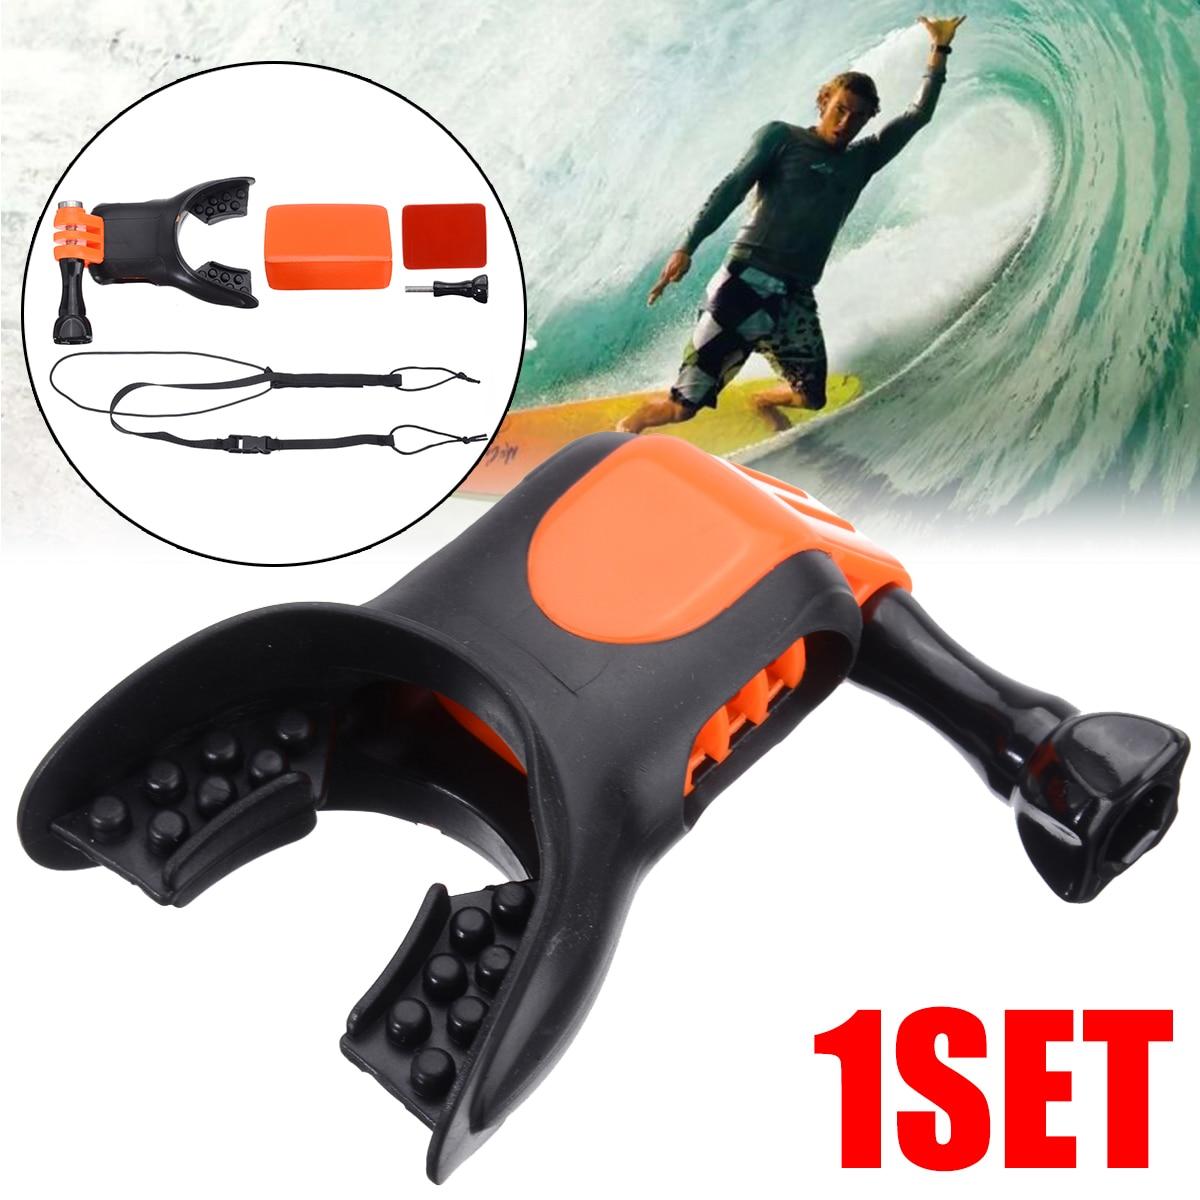 1SET Surfing Shoot Surf Dummy Bite Mouth Mount Teeth Braces Holder For GoPro Hero 4/3+/3/2/1 Camera